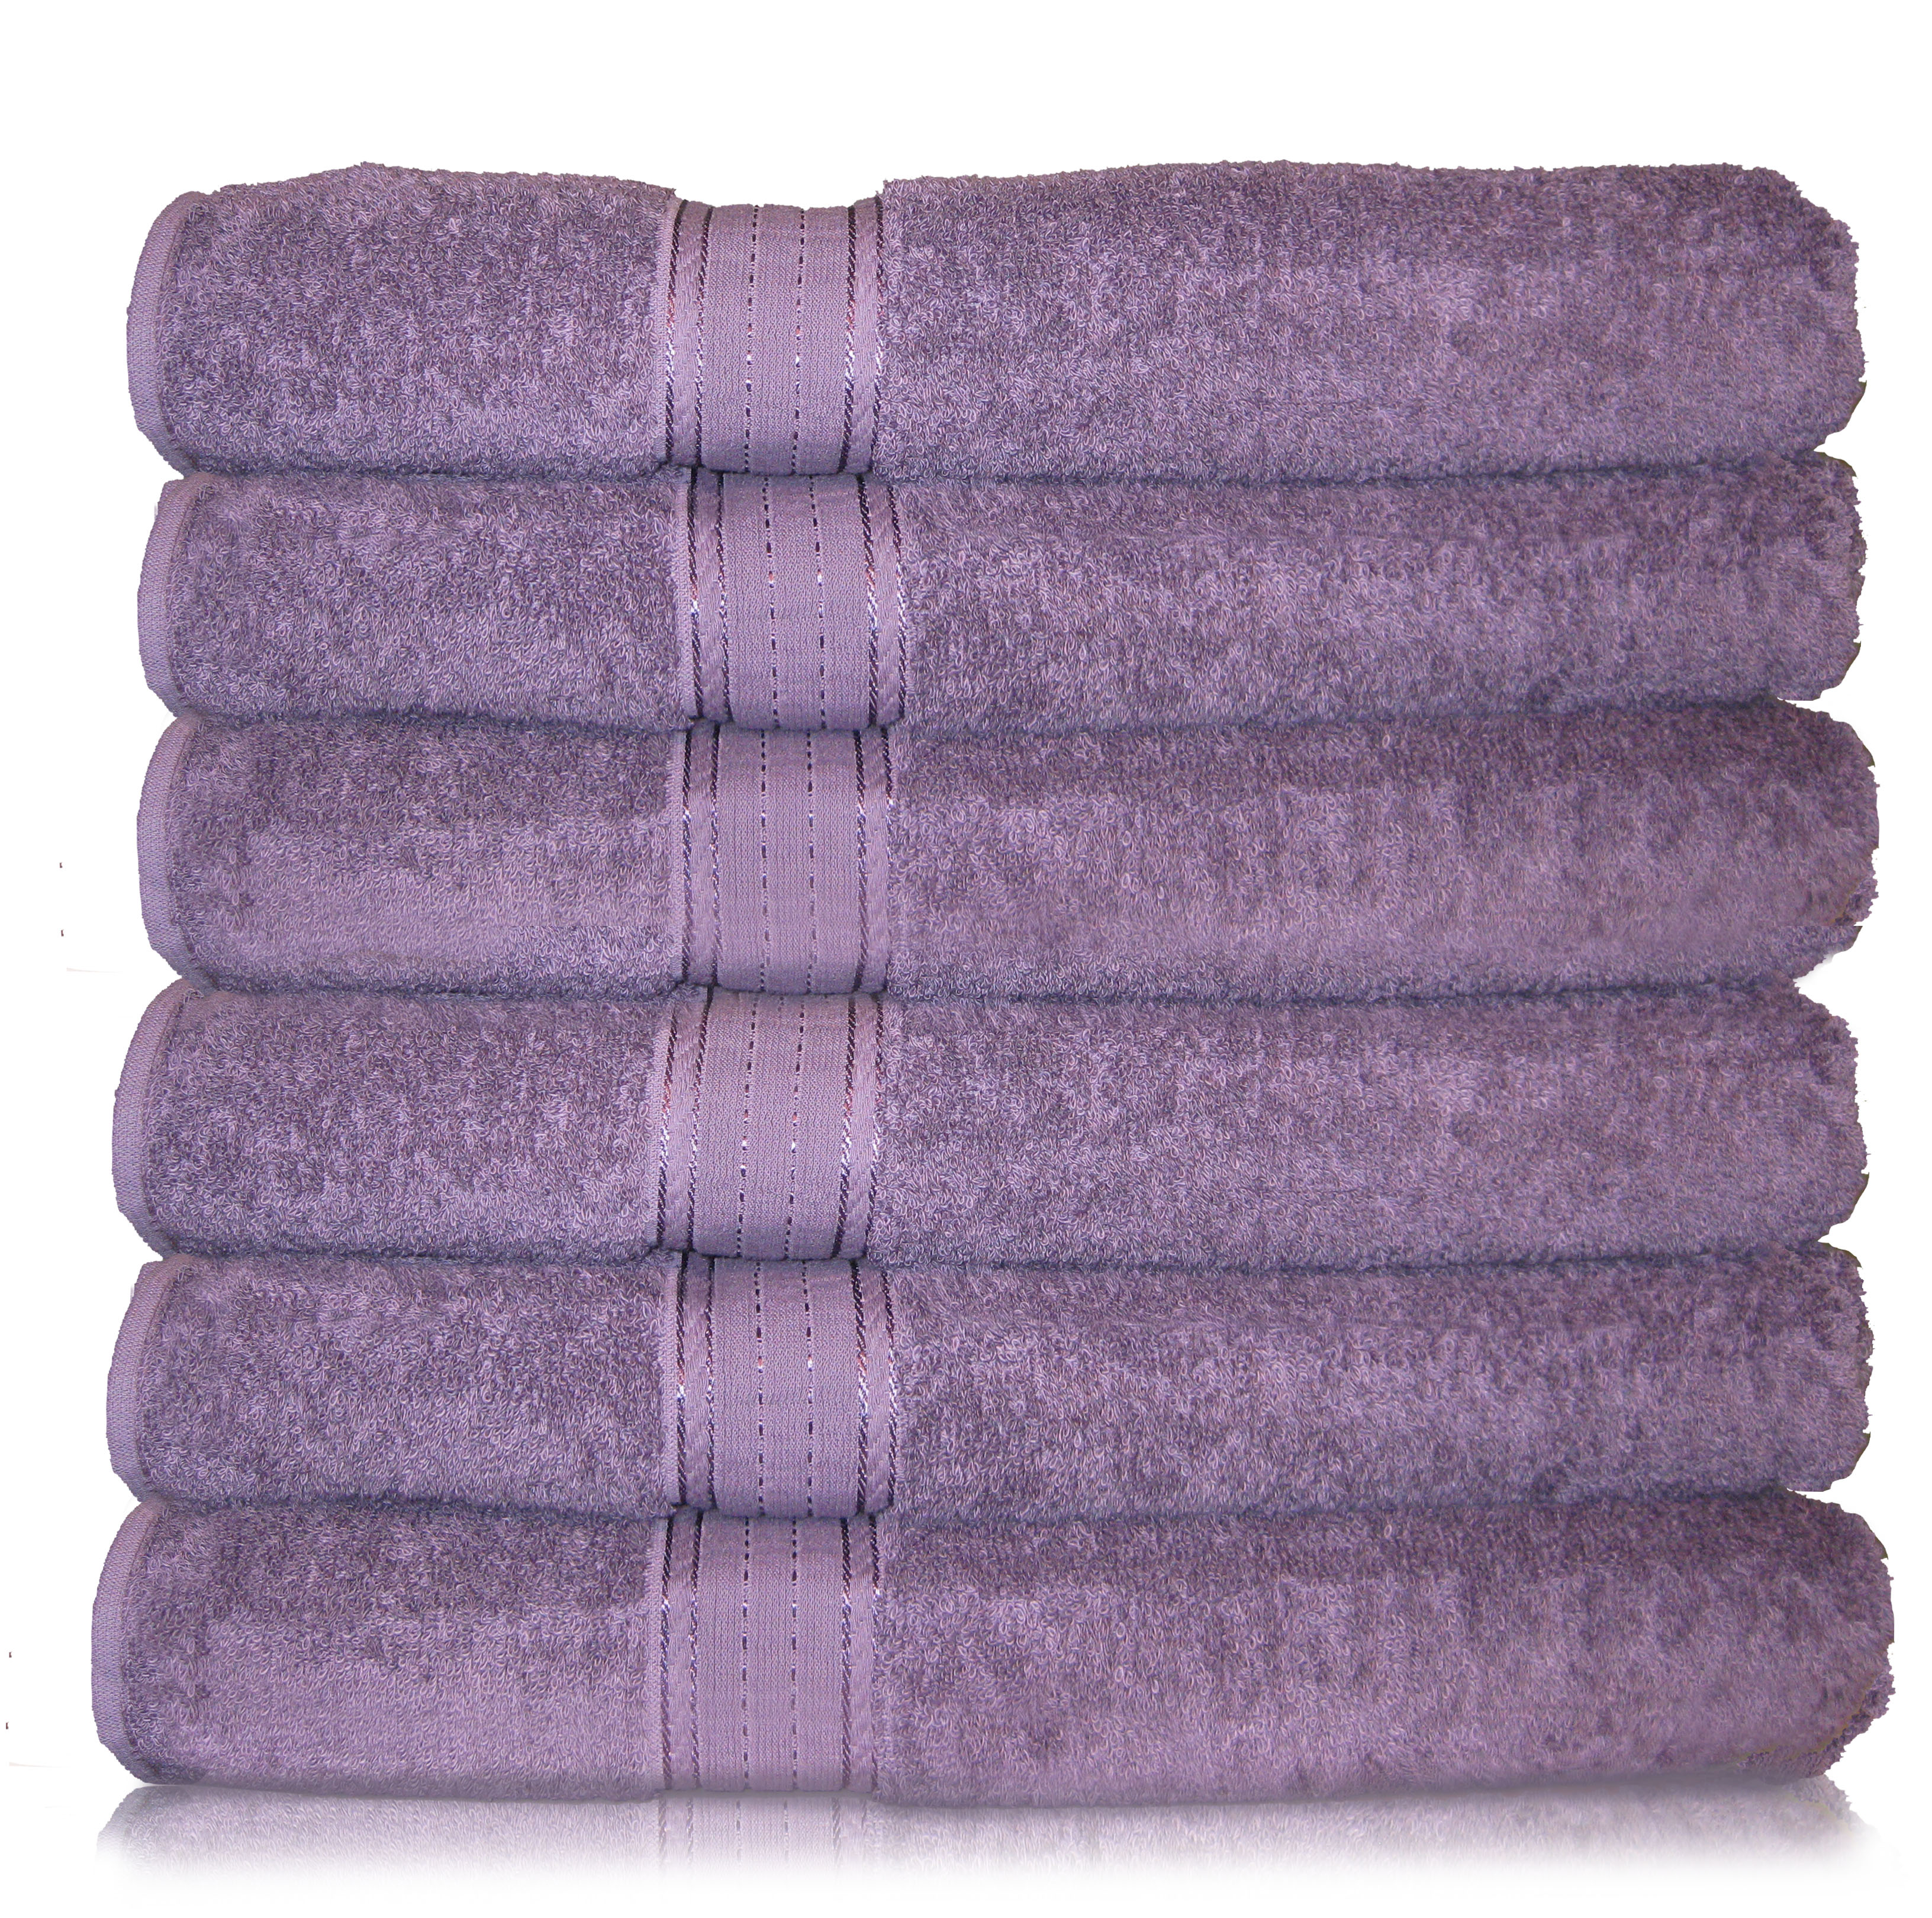 Purple bathroom towels bath sheets plush soft 100 luxurious egyptian